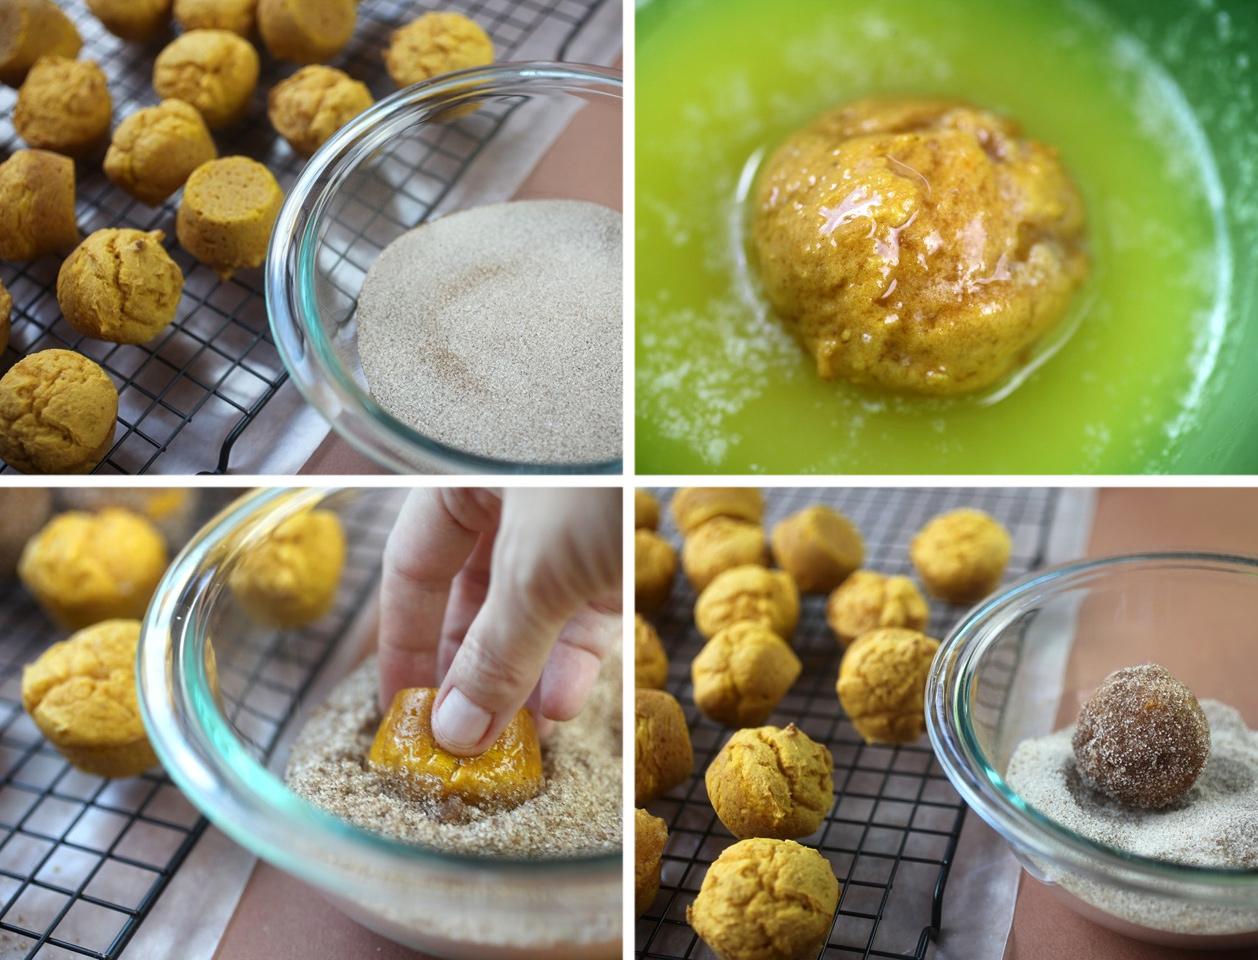 Dunking Mini Muffins